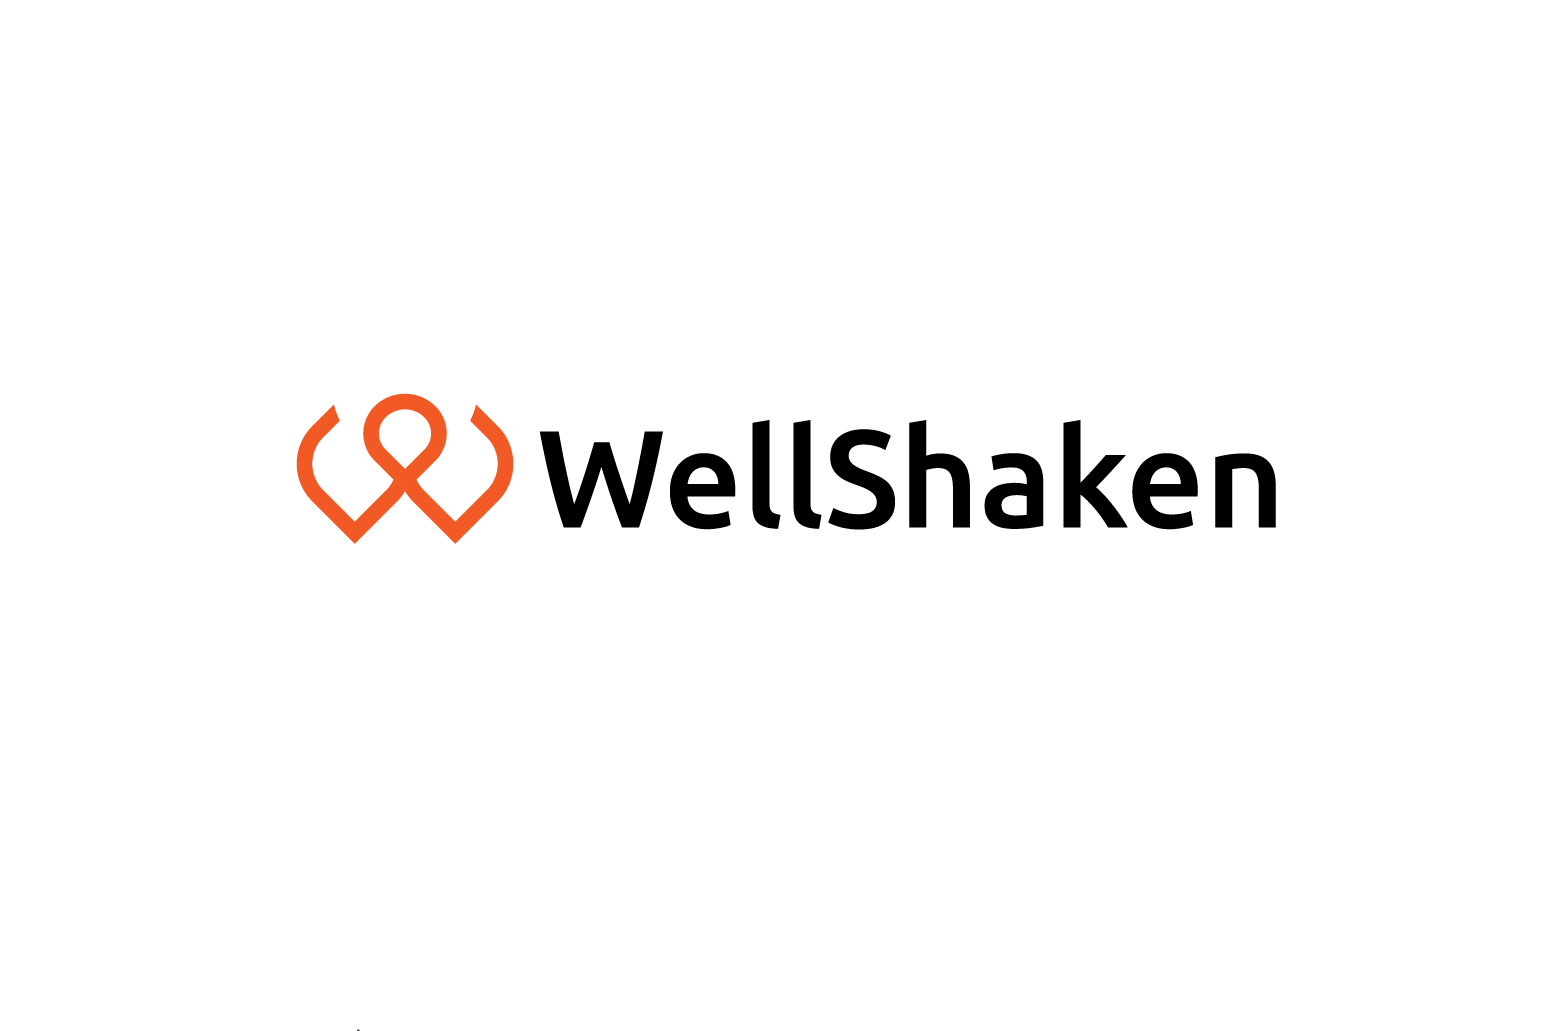 WellShaken.com